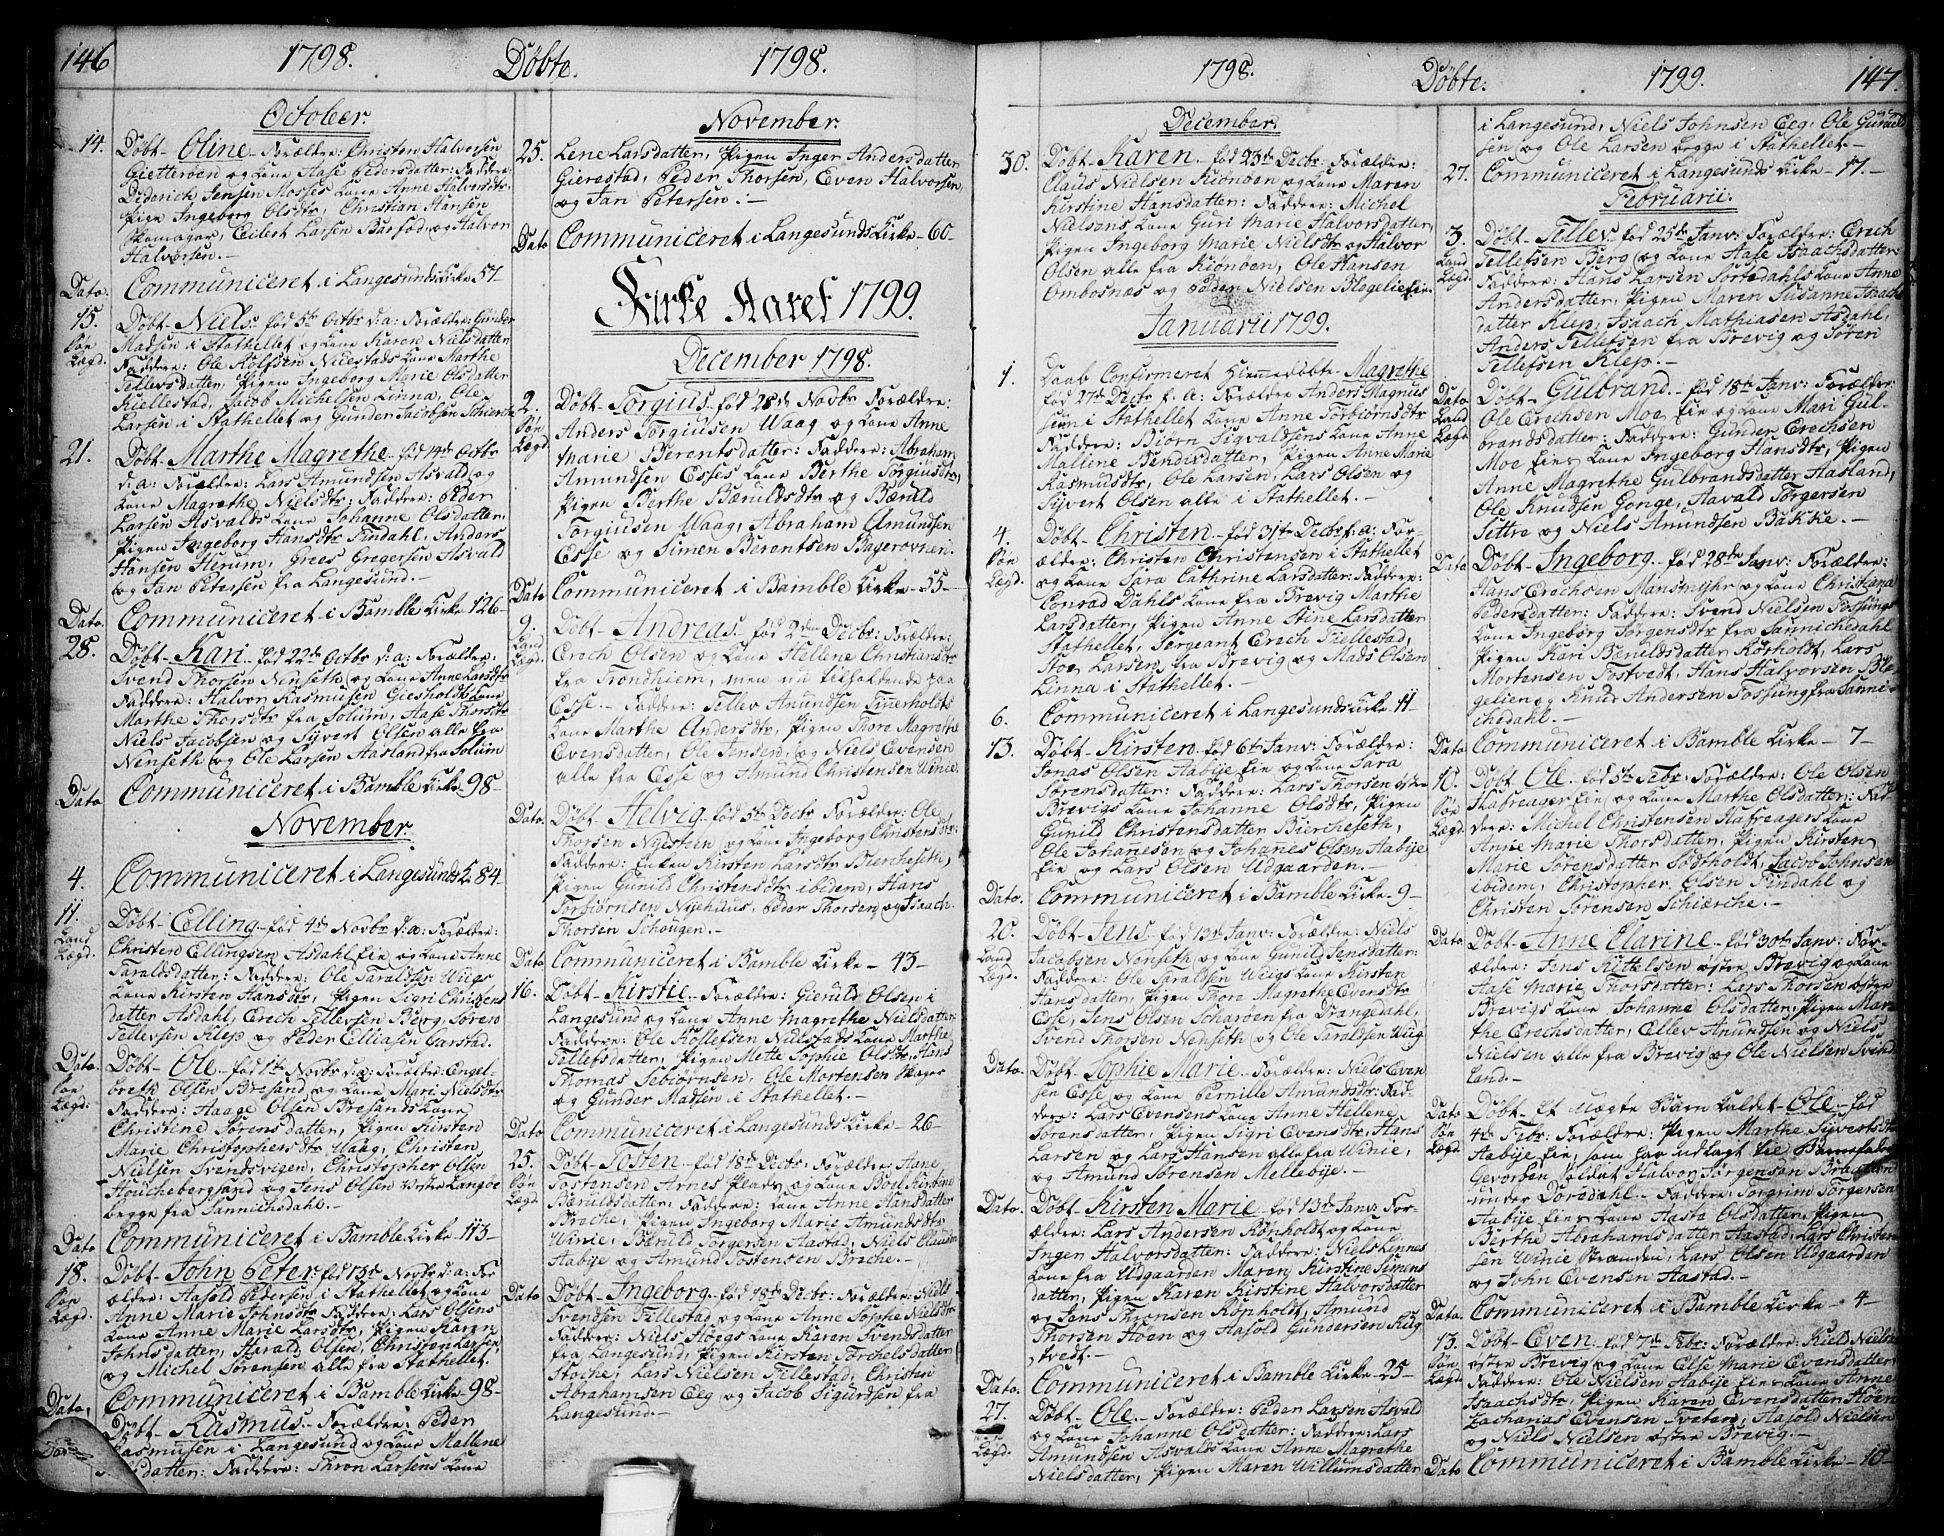 SAKO, Bamble kirkebøker, F/Fa/L0002: Ministerialbok nr. I 2, 1775-1814, s. 146-147